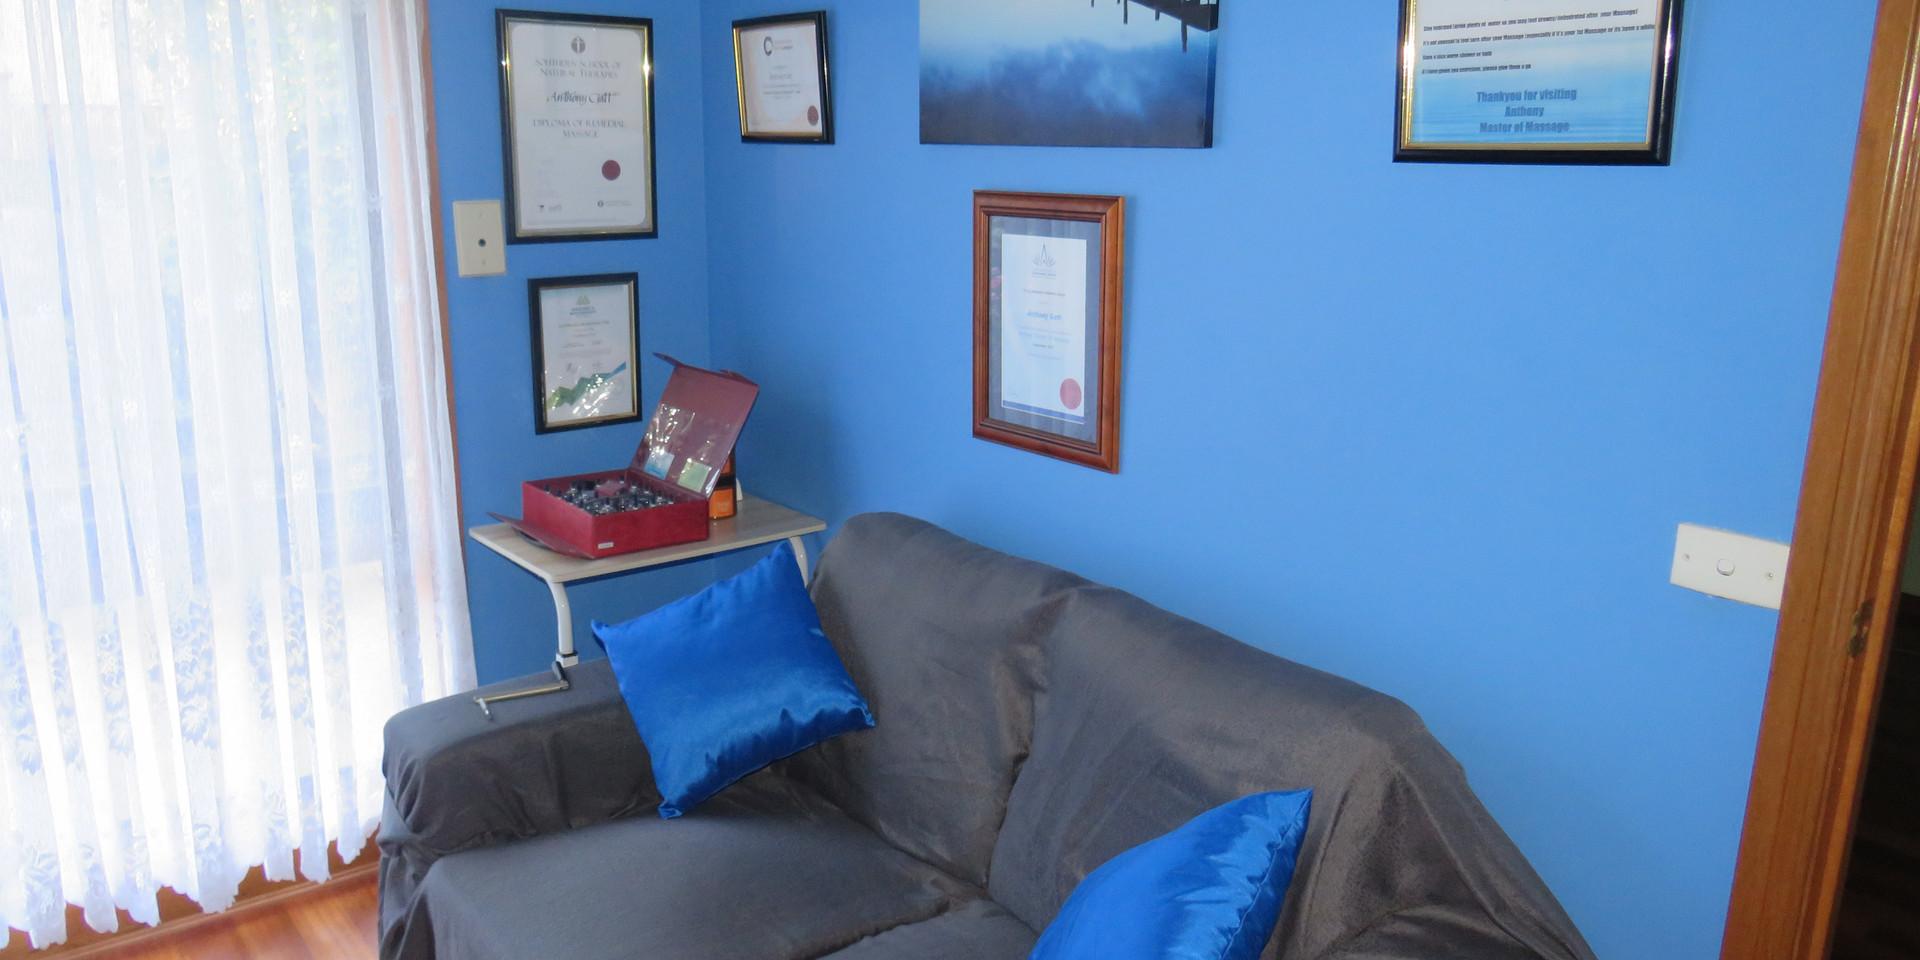 Treatment Room Photo (2/6)